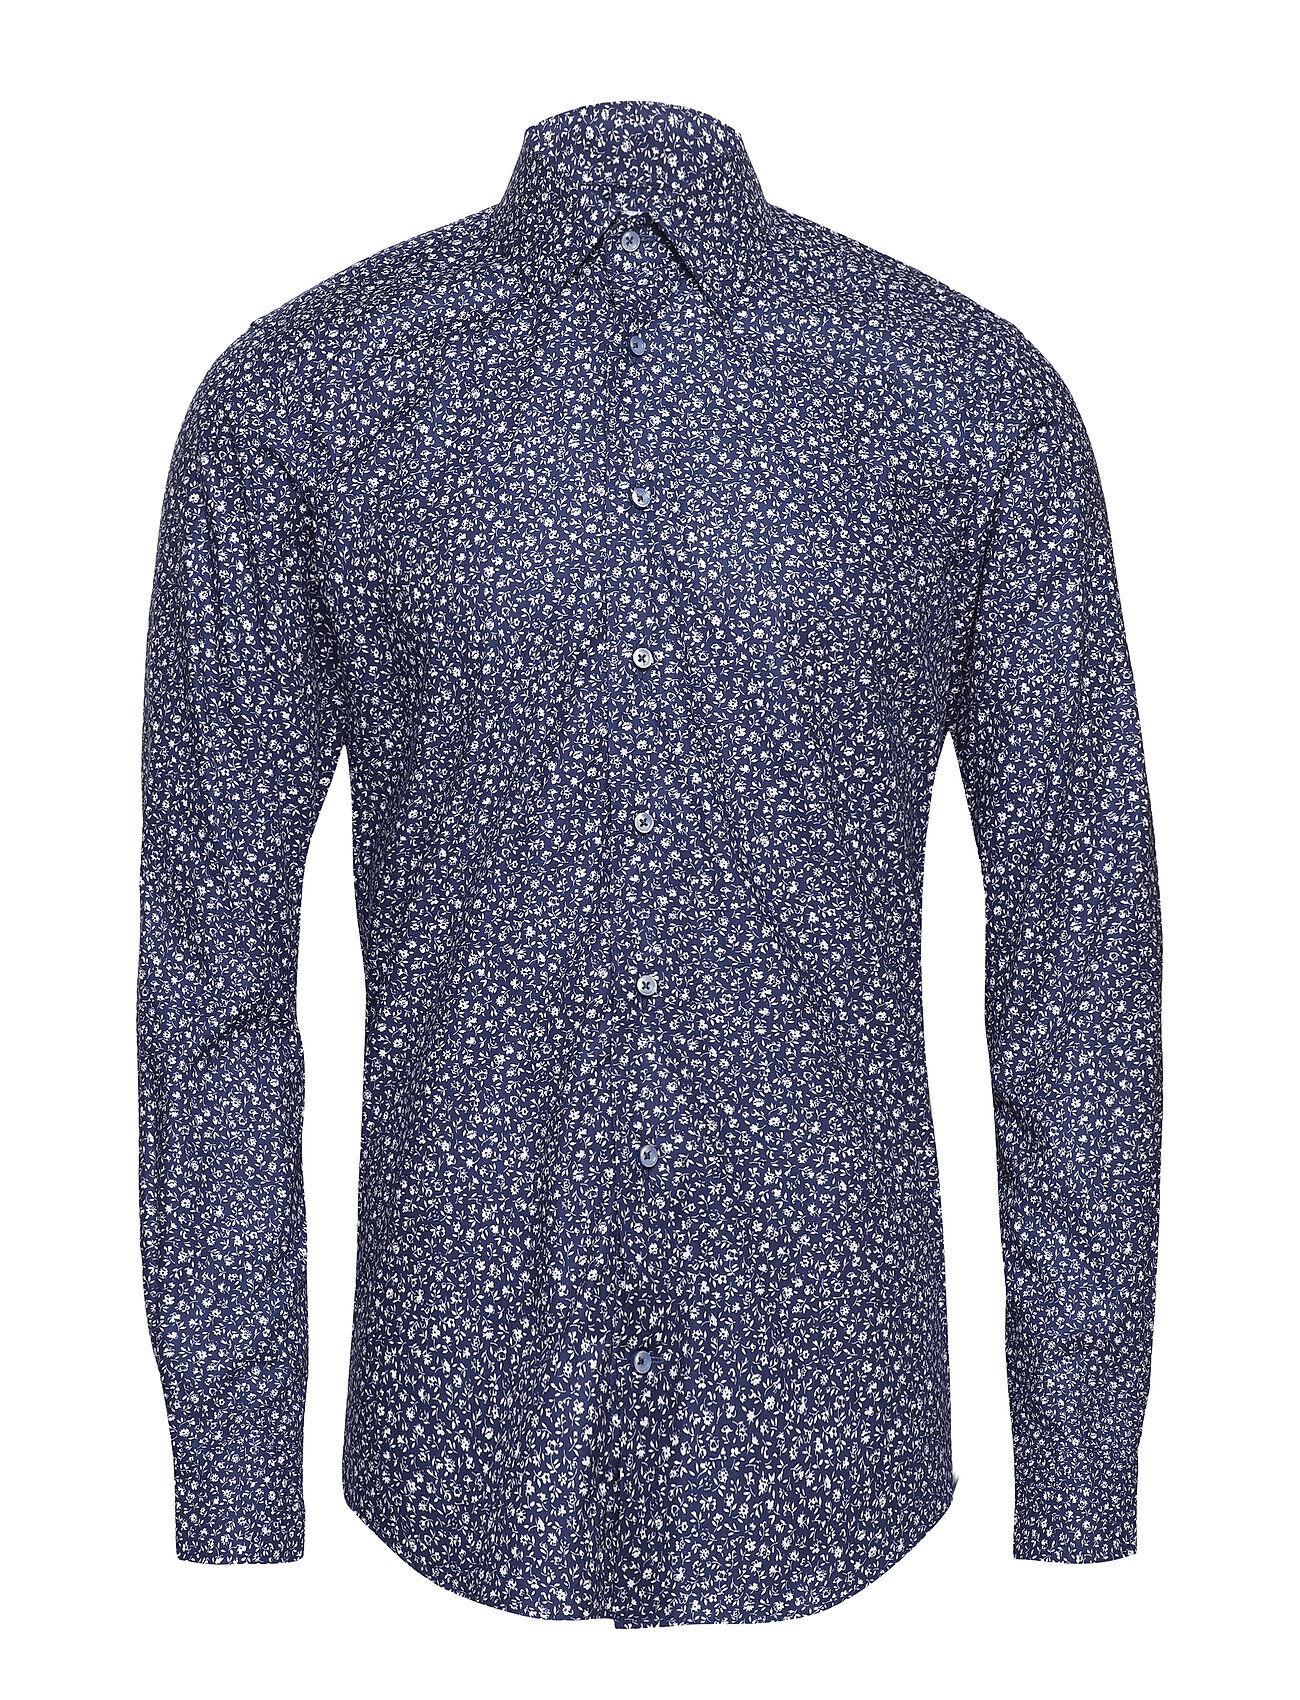 XO Shirtmaker by Sand Copenhagen 8077 - Jake Sc